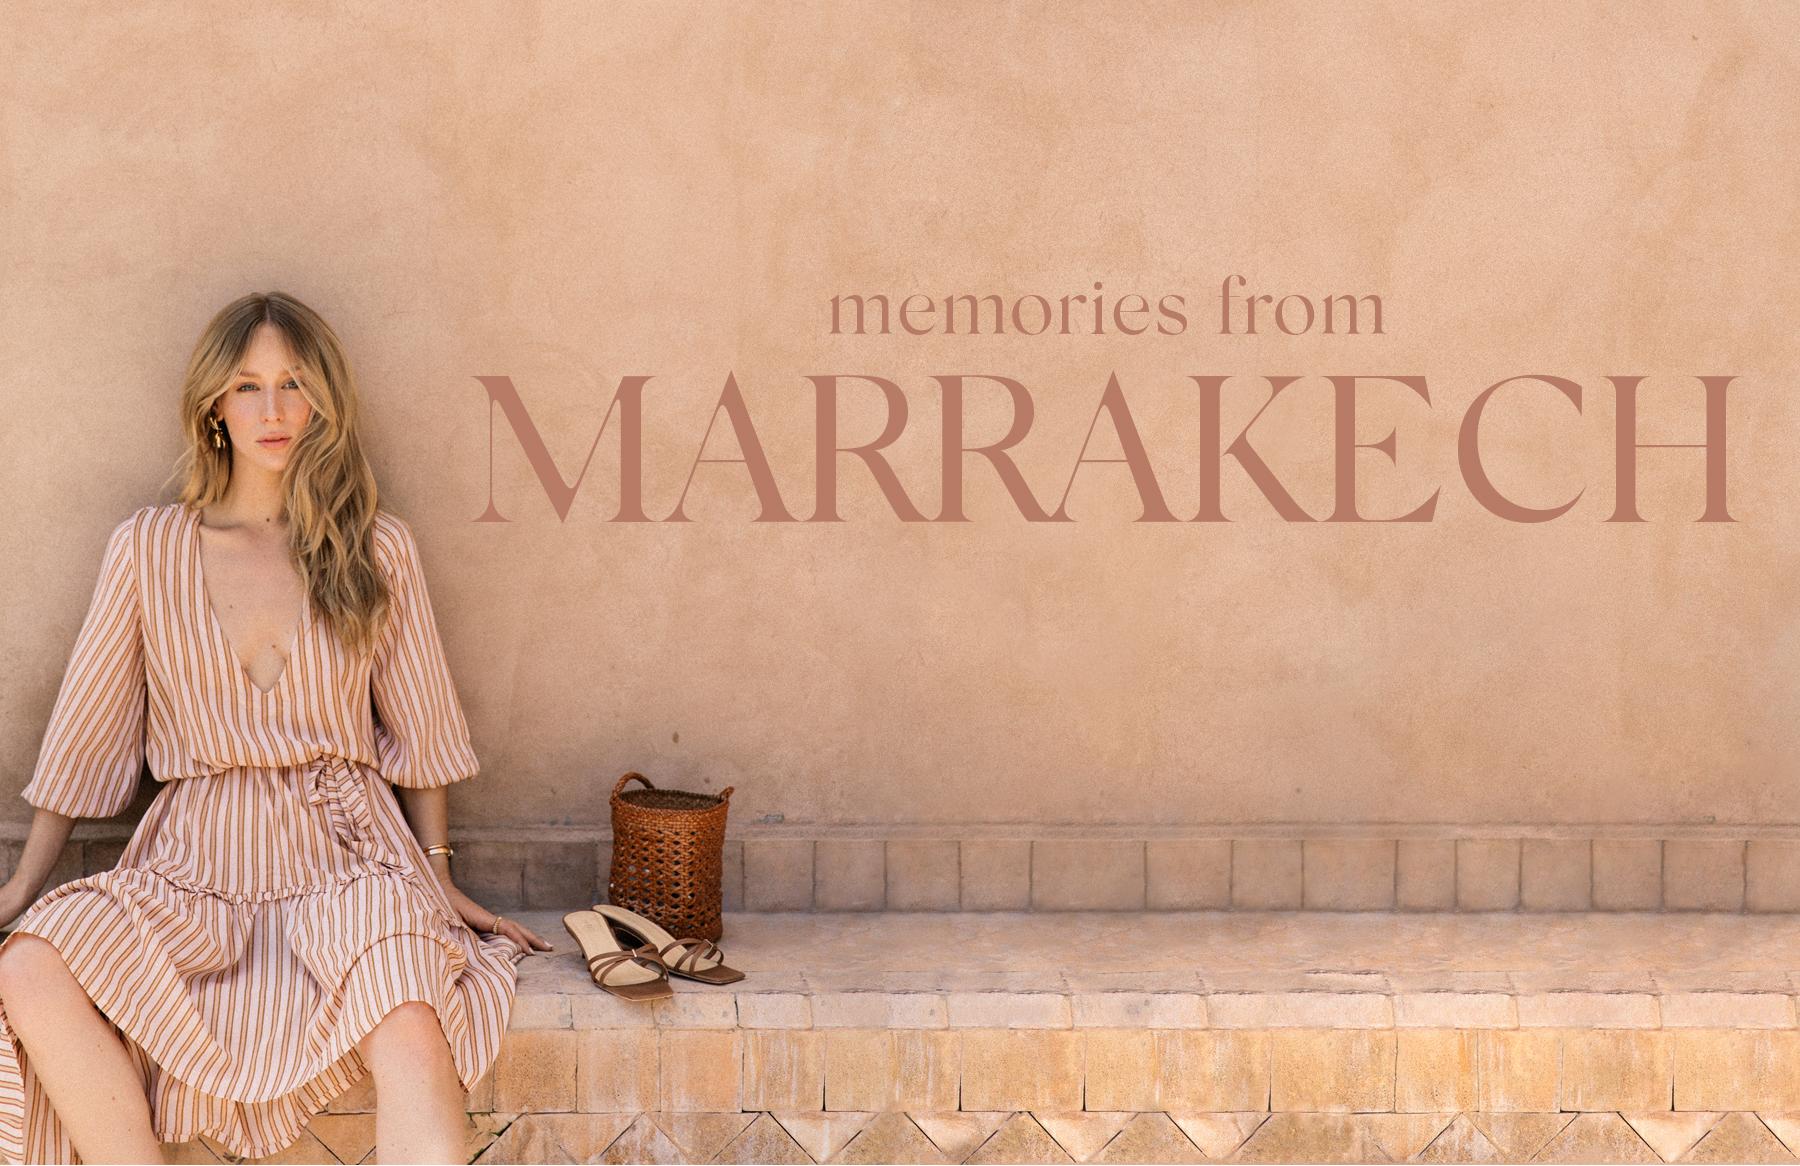 Marrakech_CarinOlsson_01.jpg